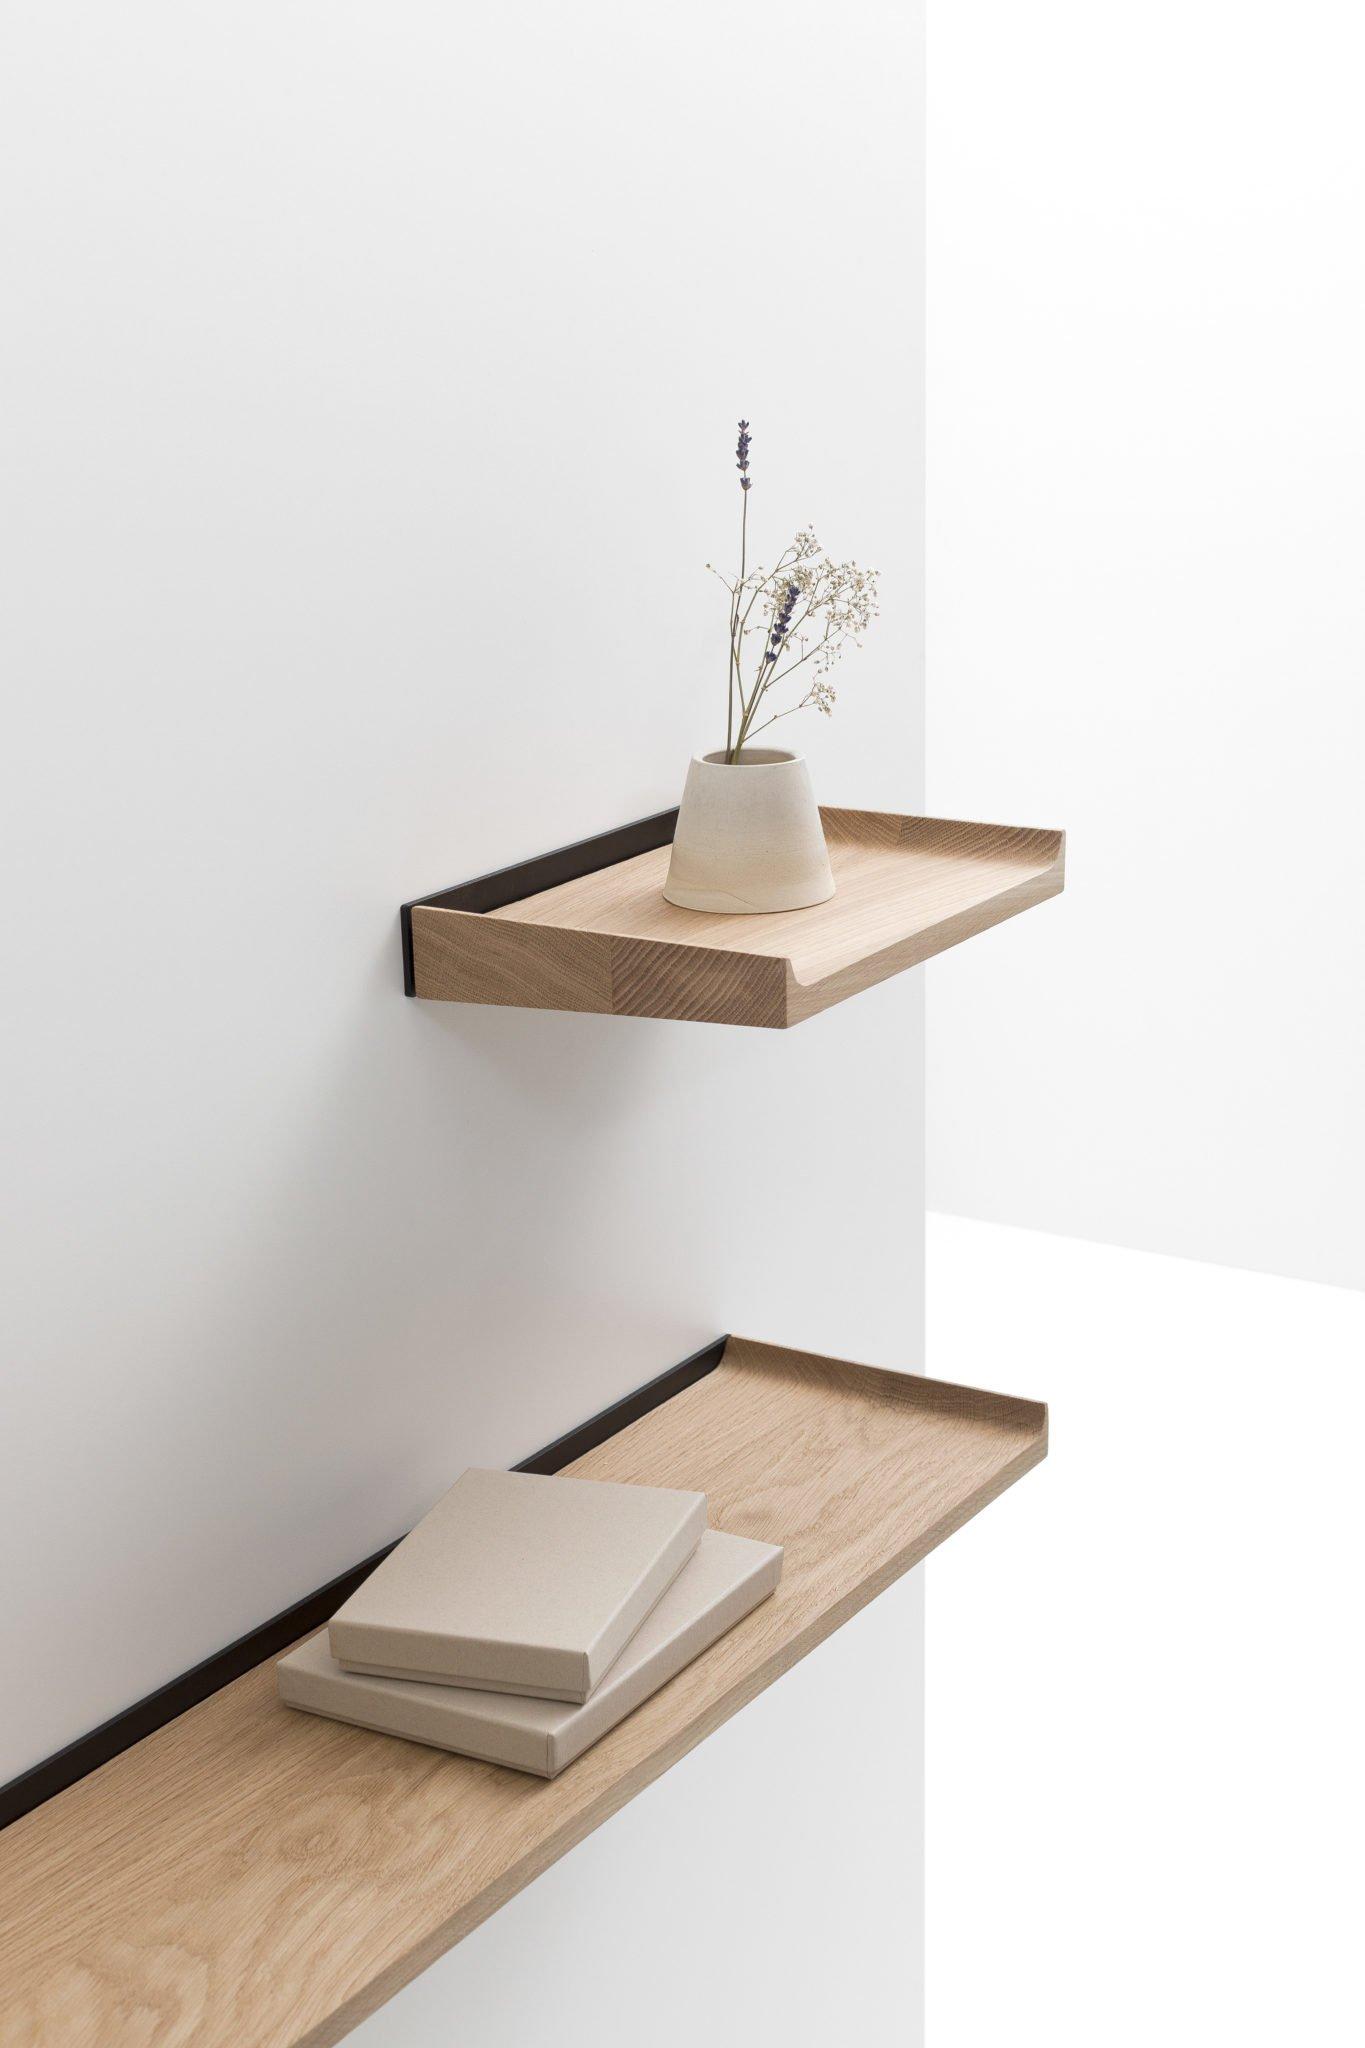 Maison et Objet 2020, Cruso Belgian wooden furniture, shelf designed by Julien Renault